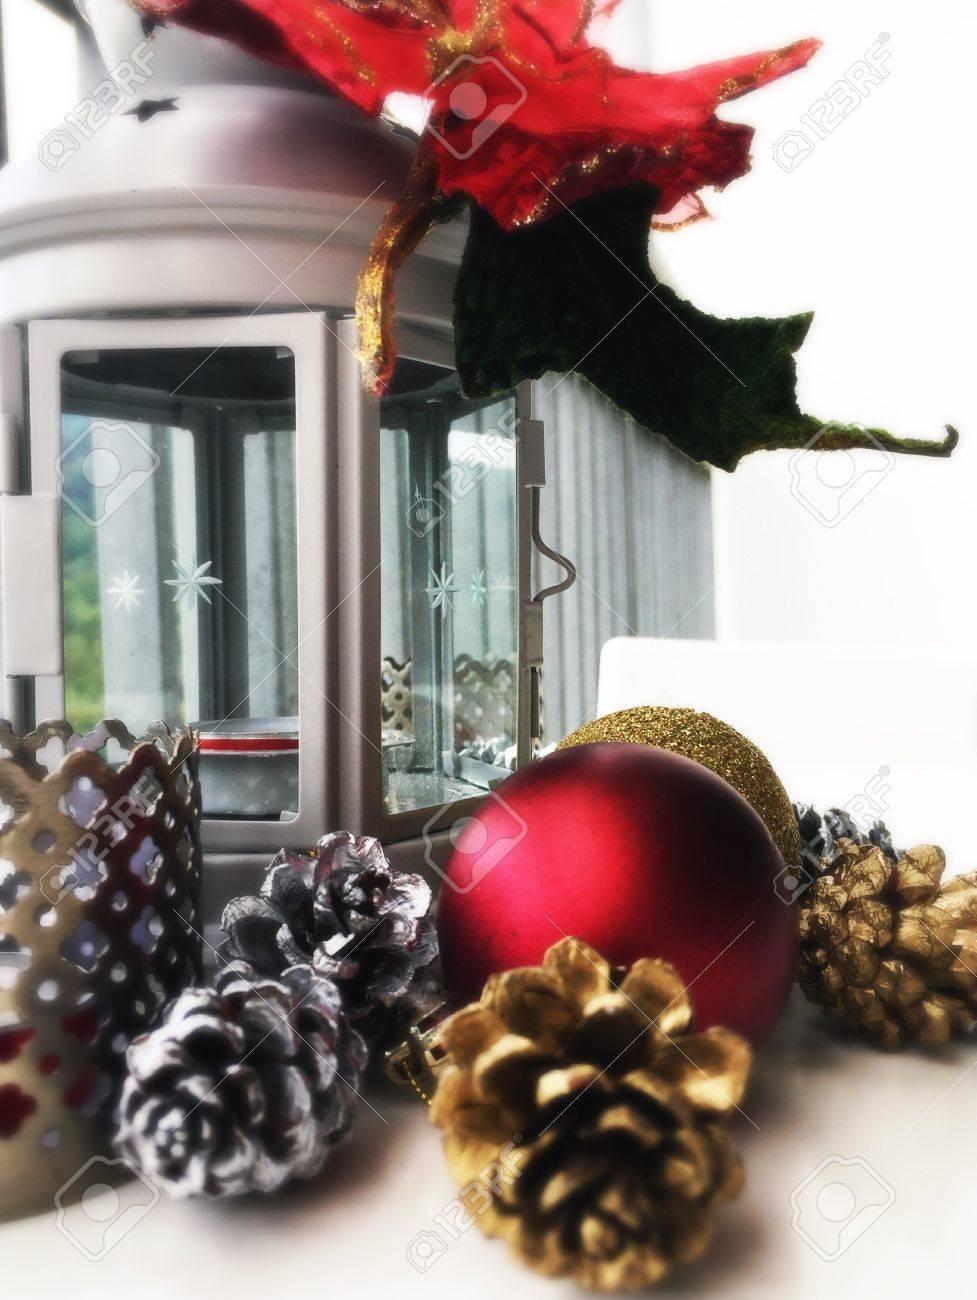 Christmas Lanterns.Christmas Lanterns And Ornaments Make A Great Christmas Decoration